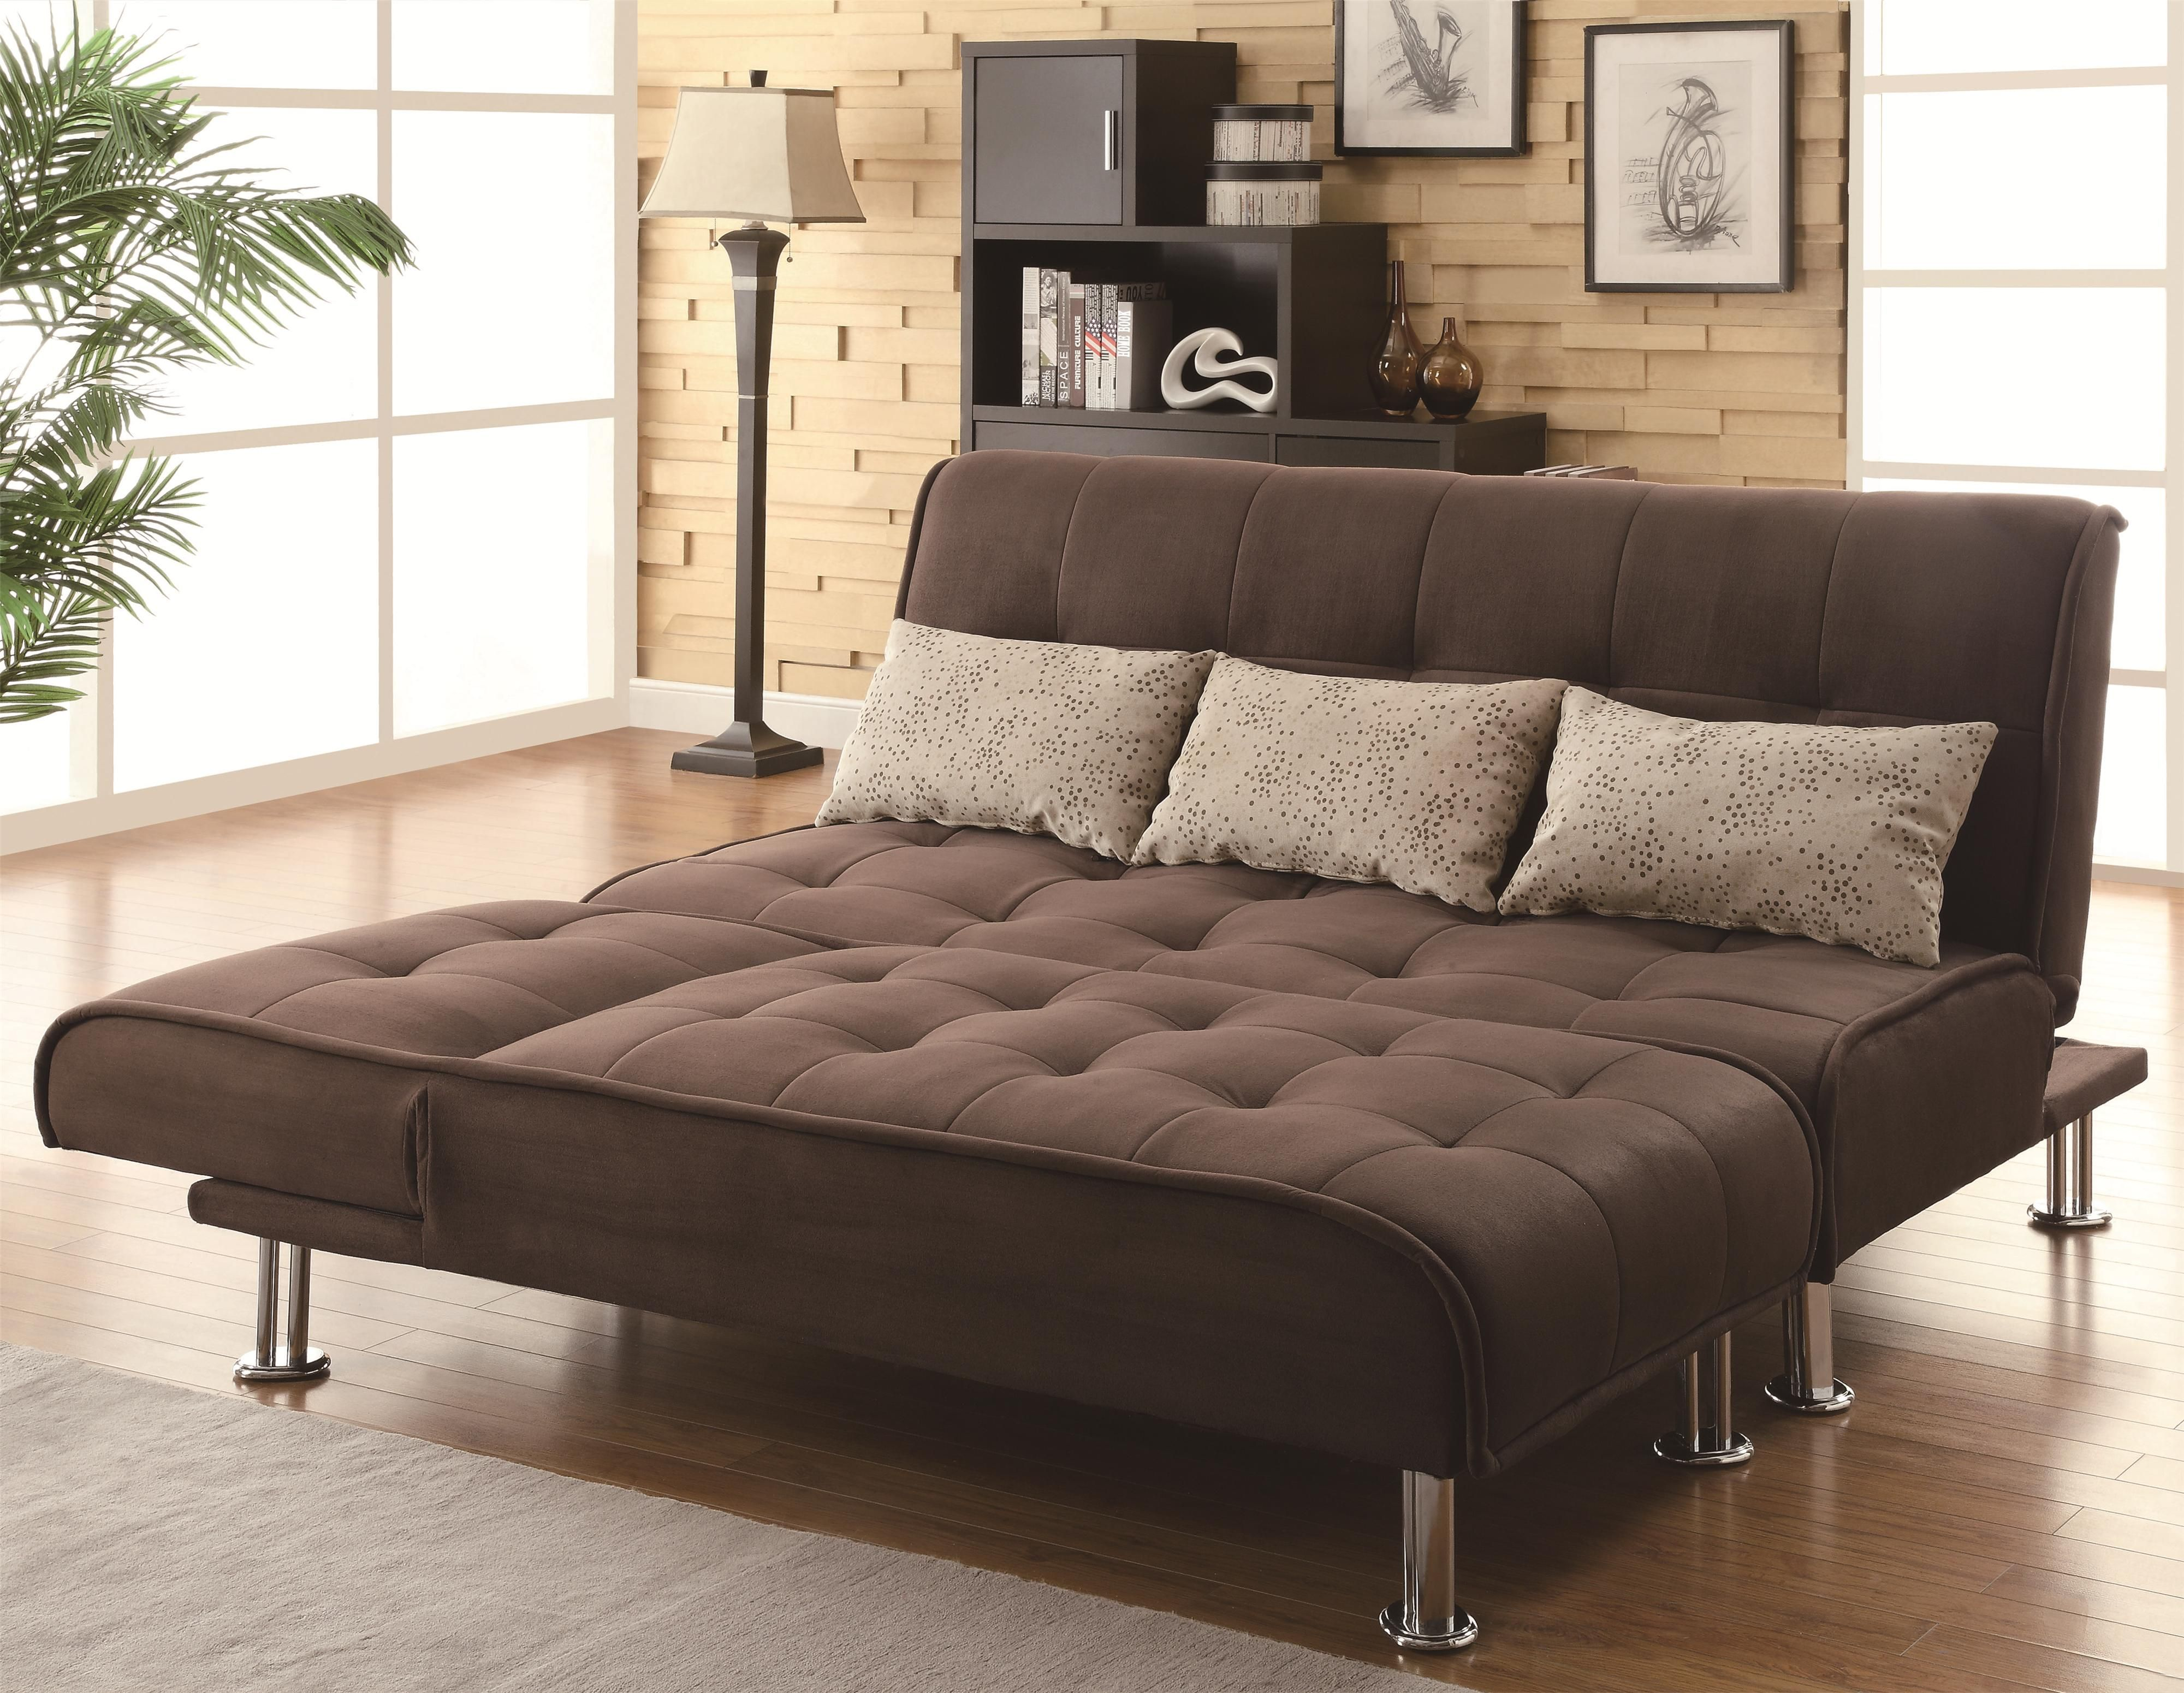 - 300276B - Sofa Beds Transitional Styled Sofa Sleeper Futon Bed